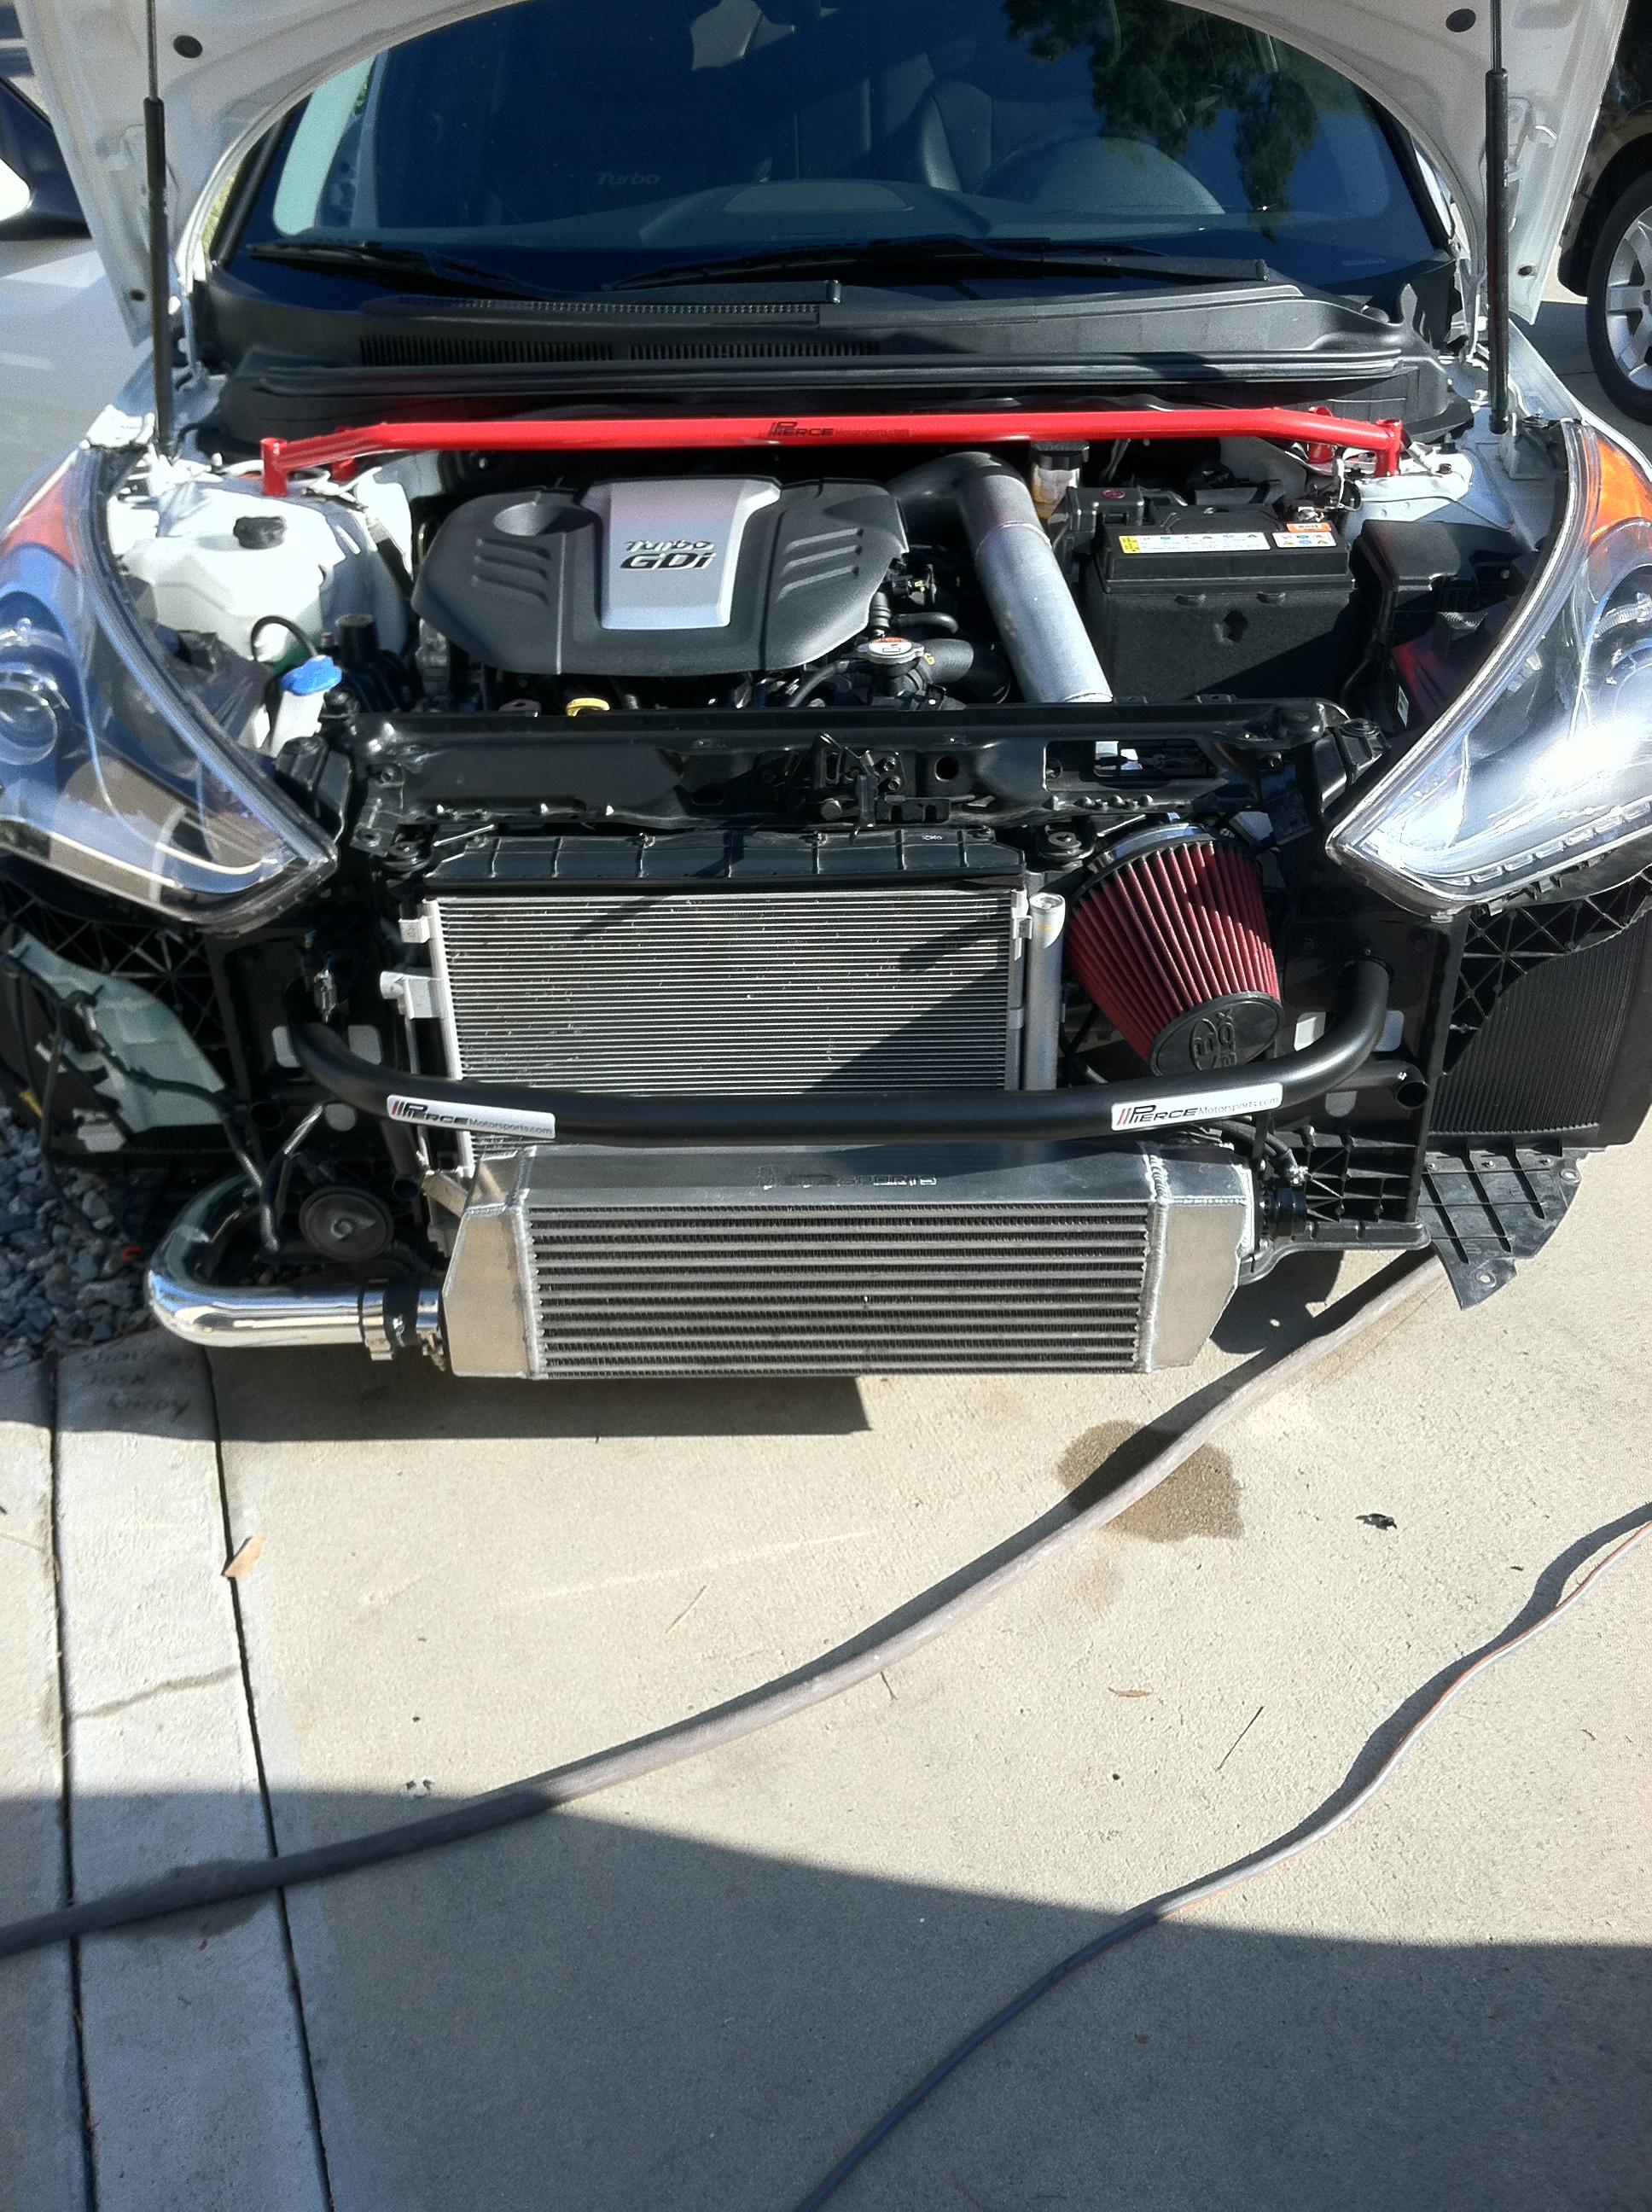 845 motorsports intercooler kit vs other kit Custom Veloster Turbo name intake 001 jpg views 4445 size 2 05 mb